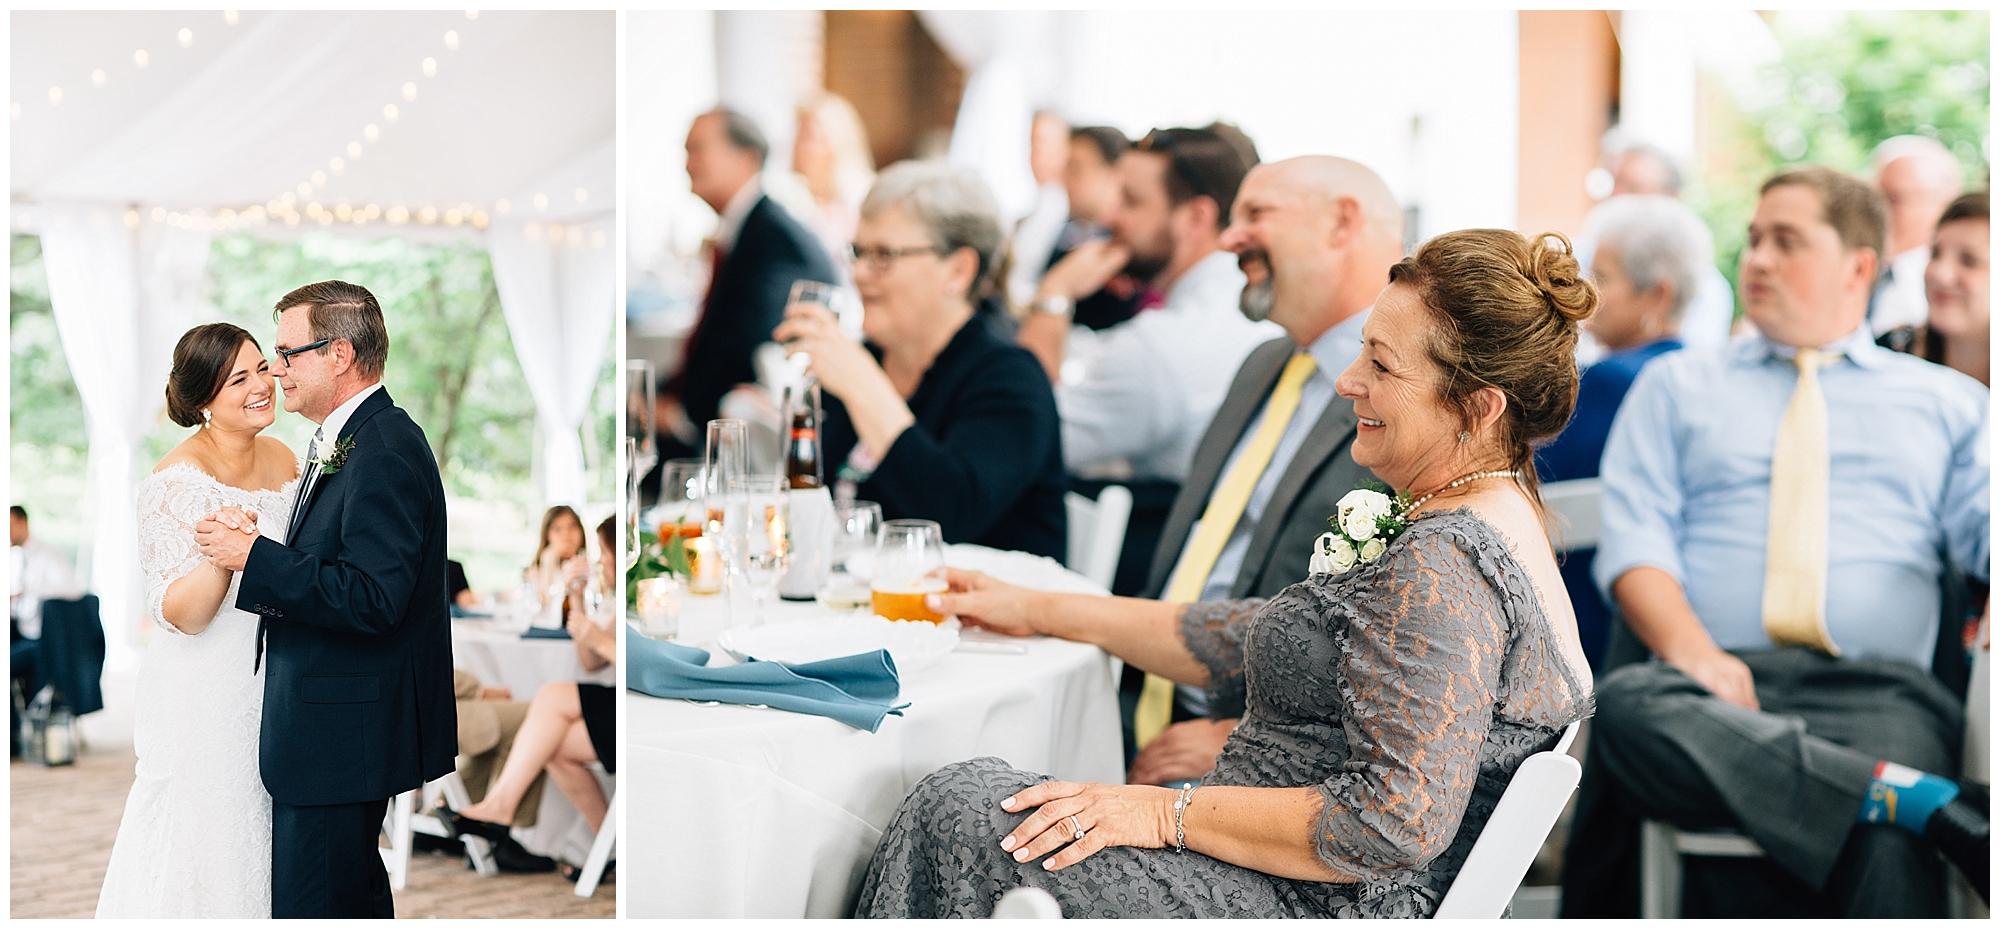 Oaks-at-salem-wedding-apex-photography-91.jpg